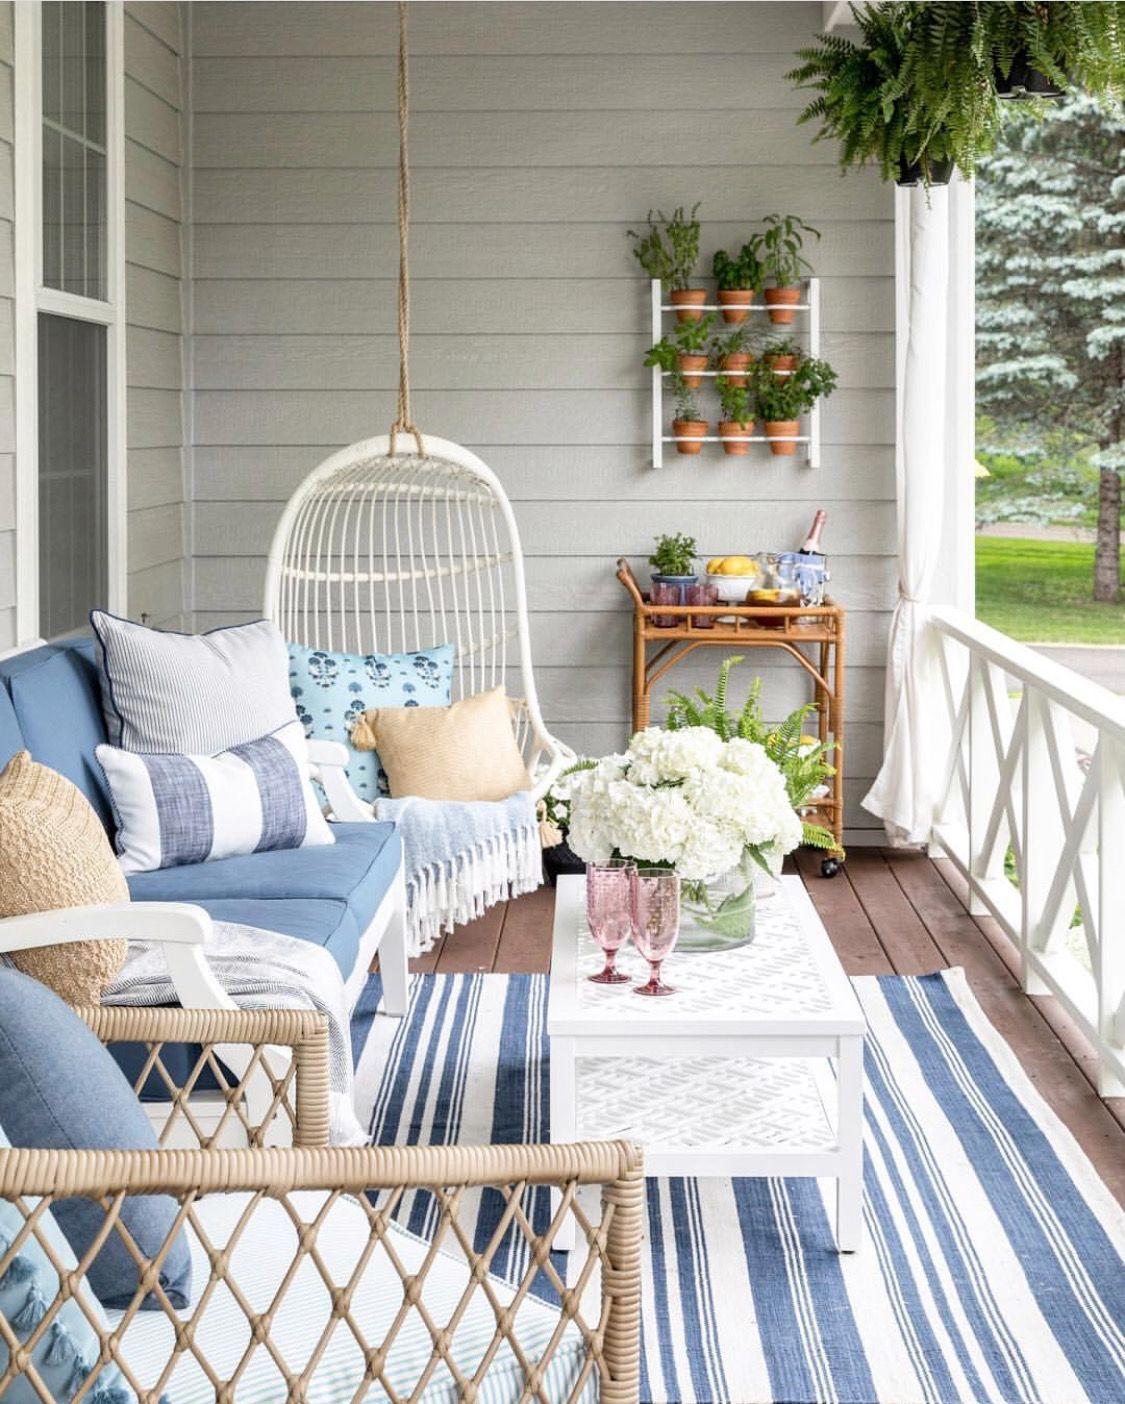 Pin By Miasah Jaber On Sunroom Front Porch Decorating Balcony